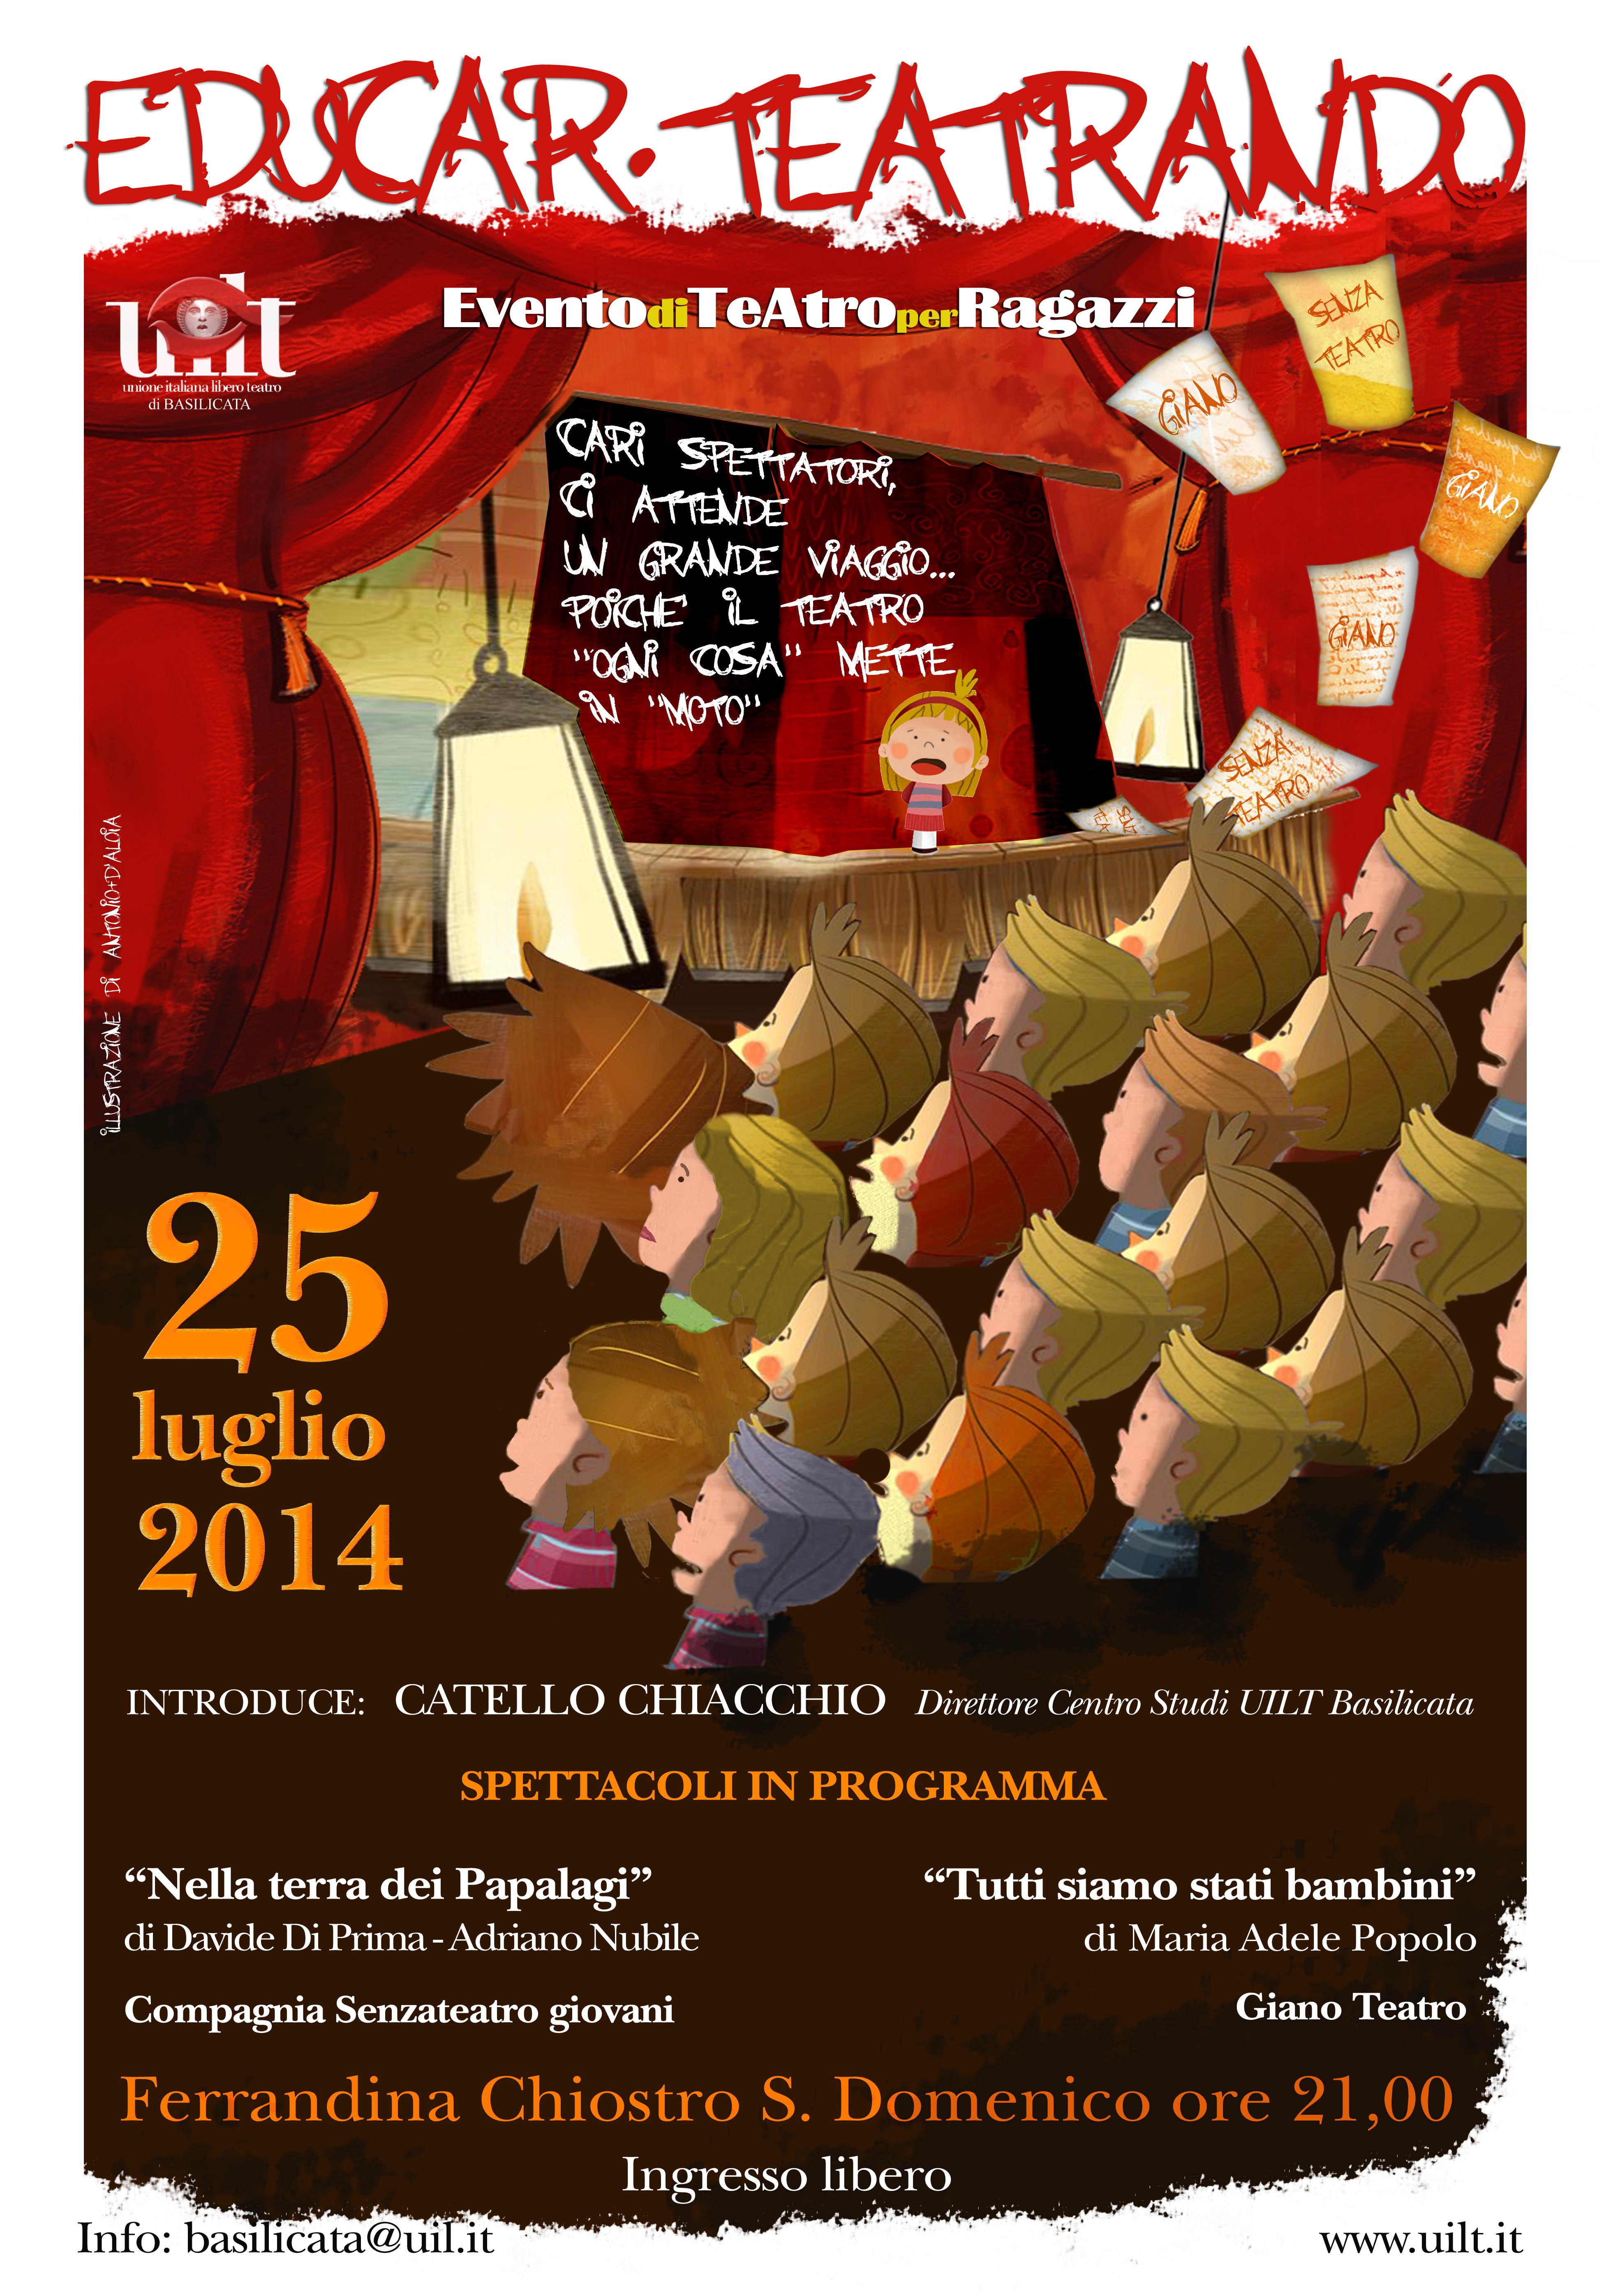 25 luglio 2014 Nella Terra dei Papalagi ad Educar.Teatrando- Ferrandina